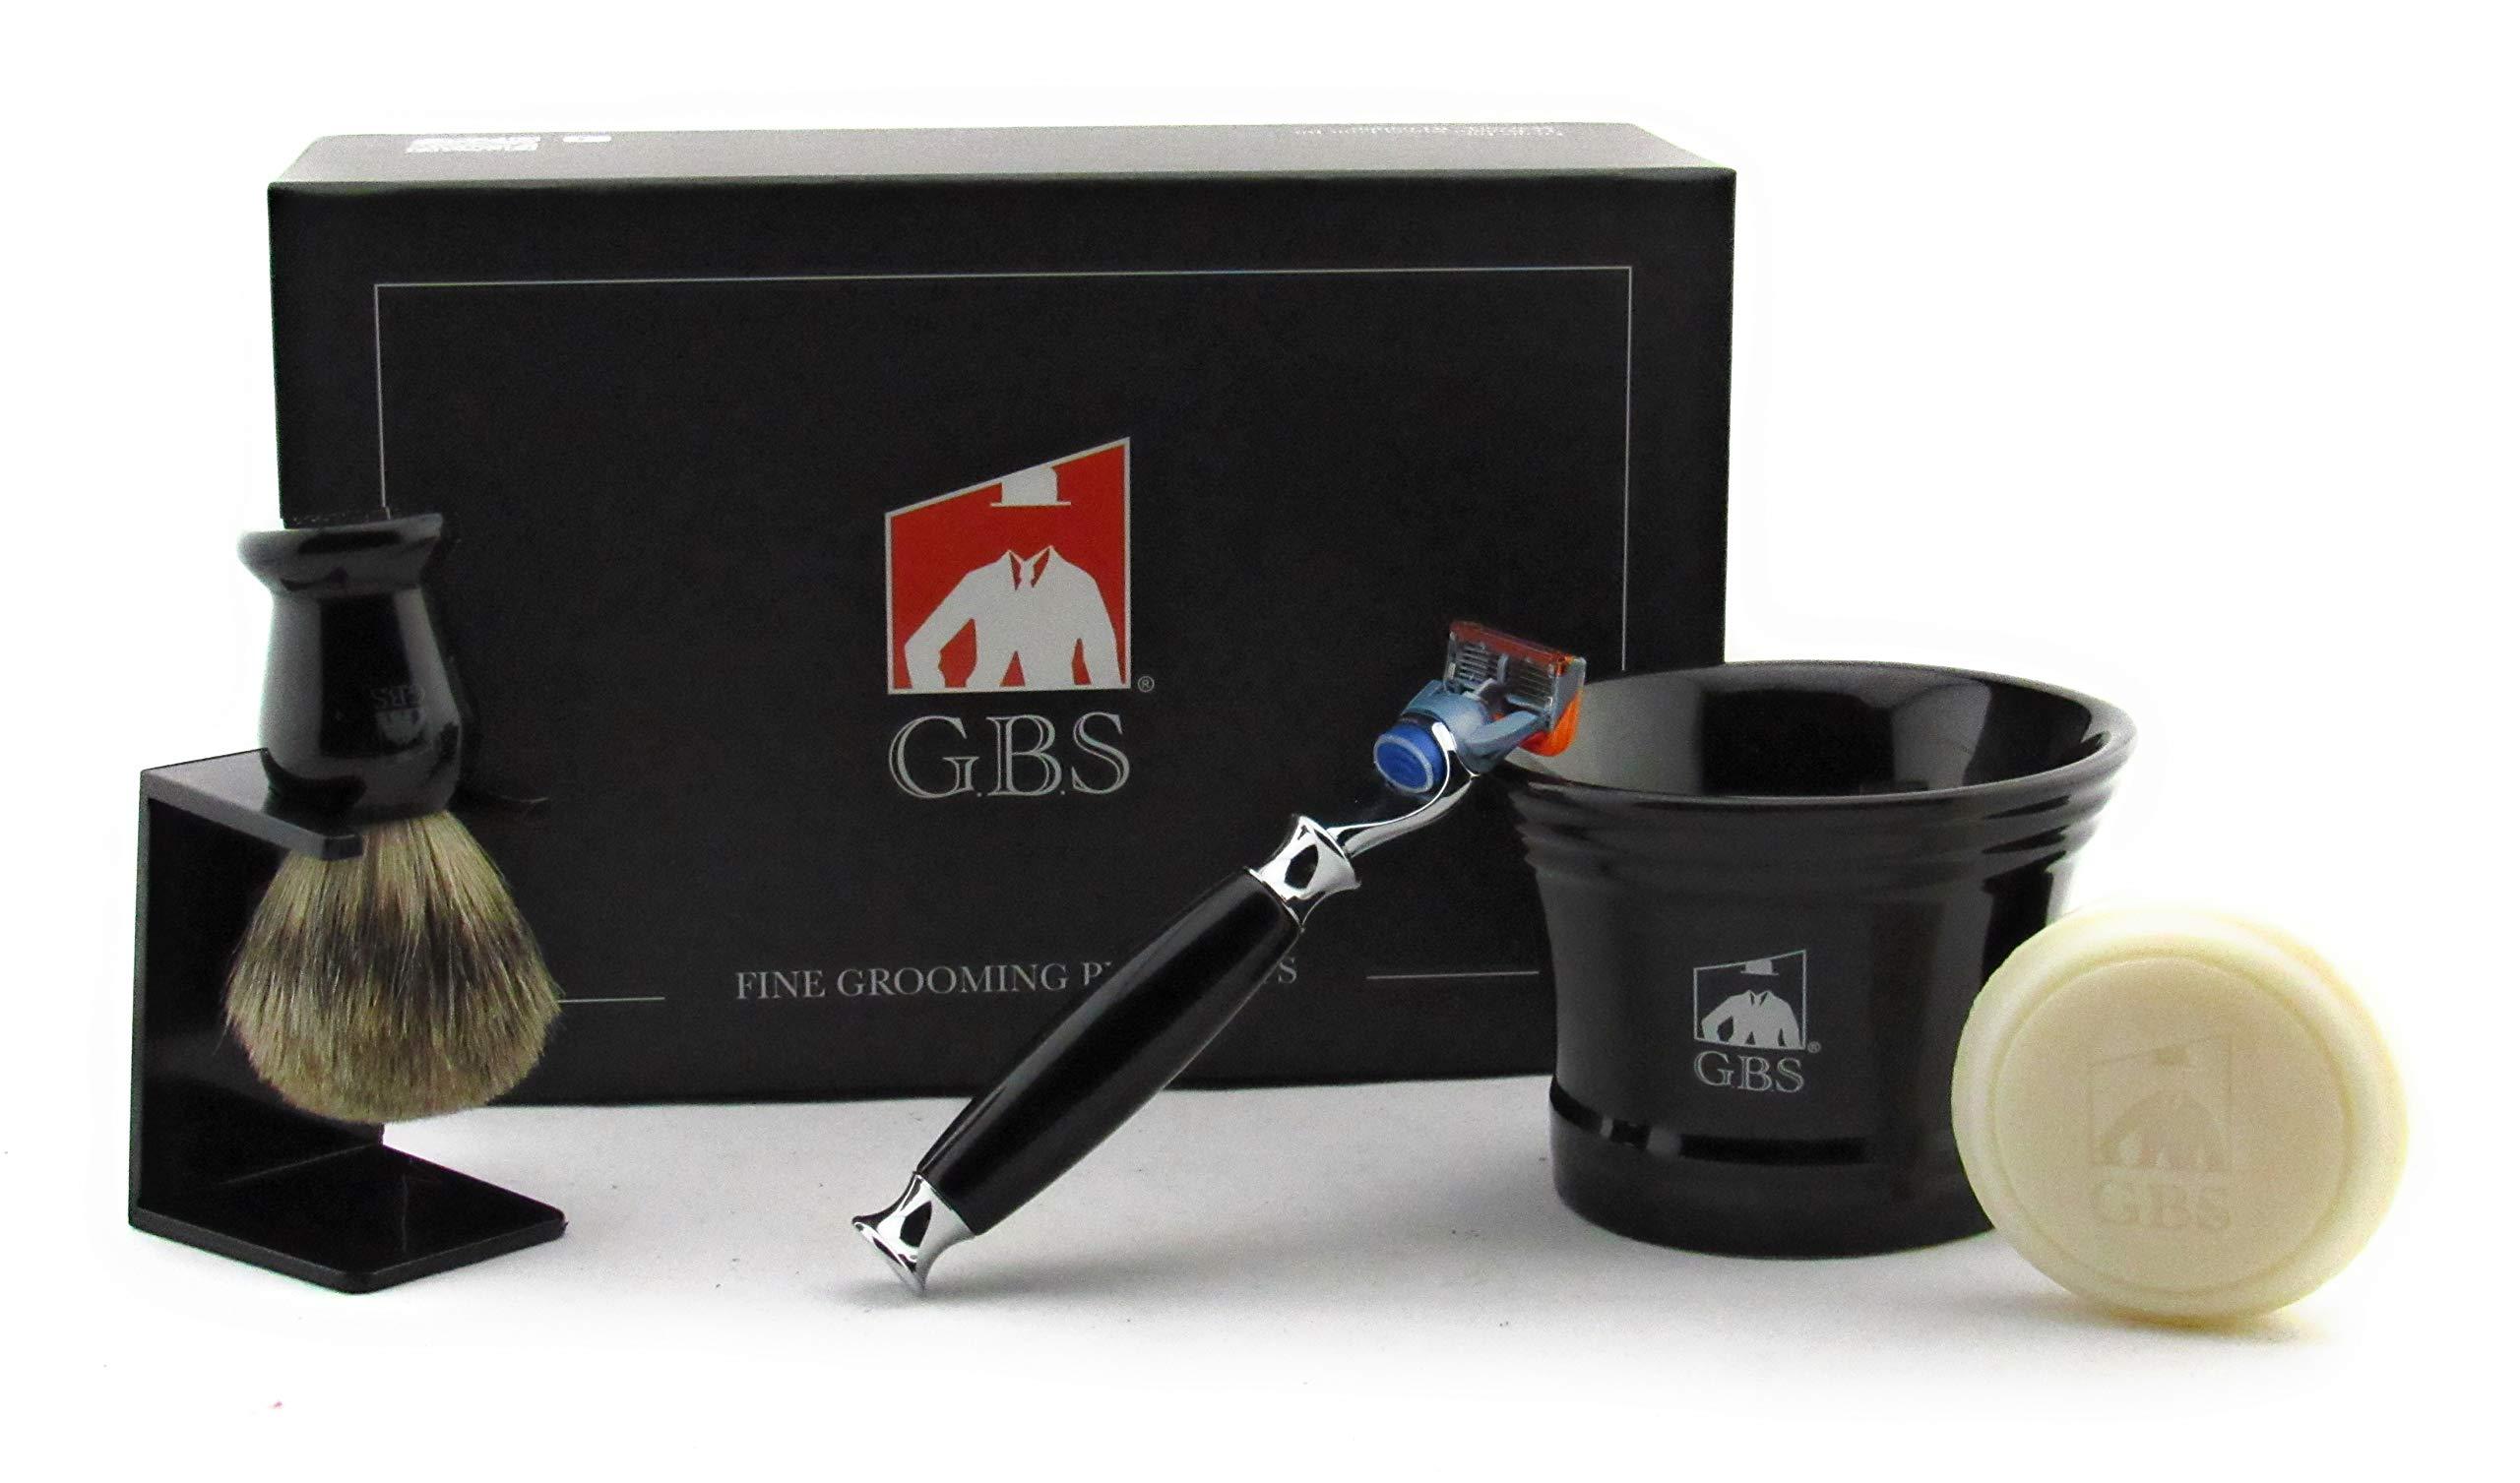 GBS 5 Blade Compatible Razor Shaving Set Gift Box - 5 Blade Razor, Ceramic Mug, Natural Soap, Pure Badger Brush + Stand - Old Fashioned Wet Shaving Experience (Black)